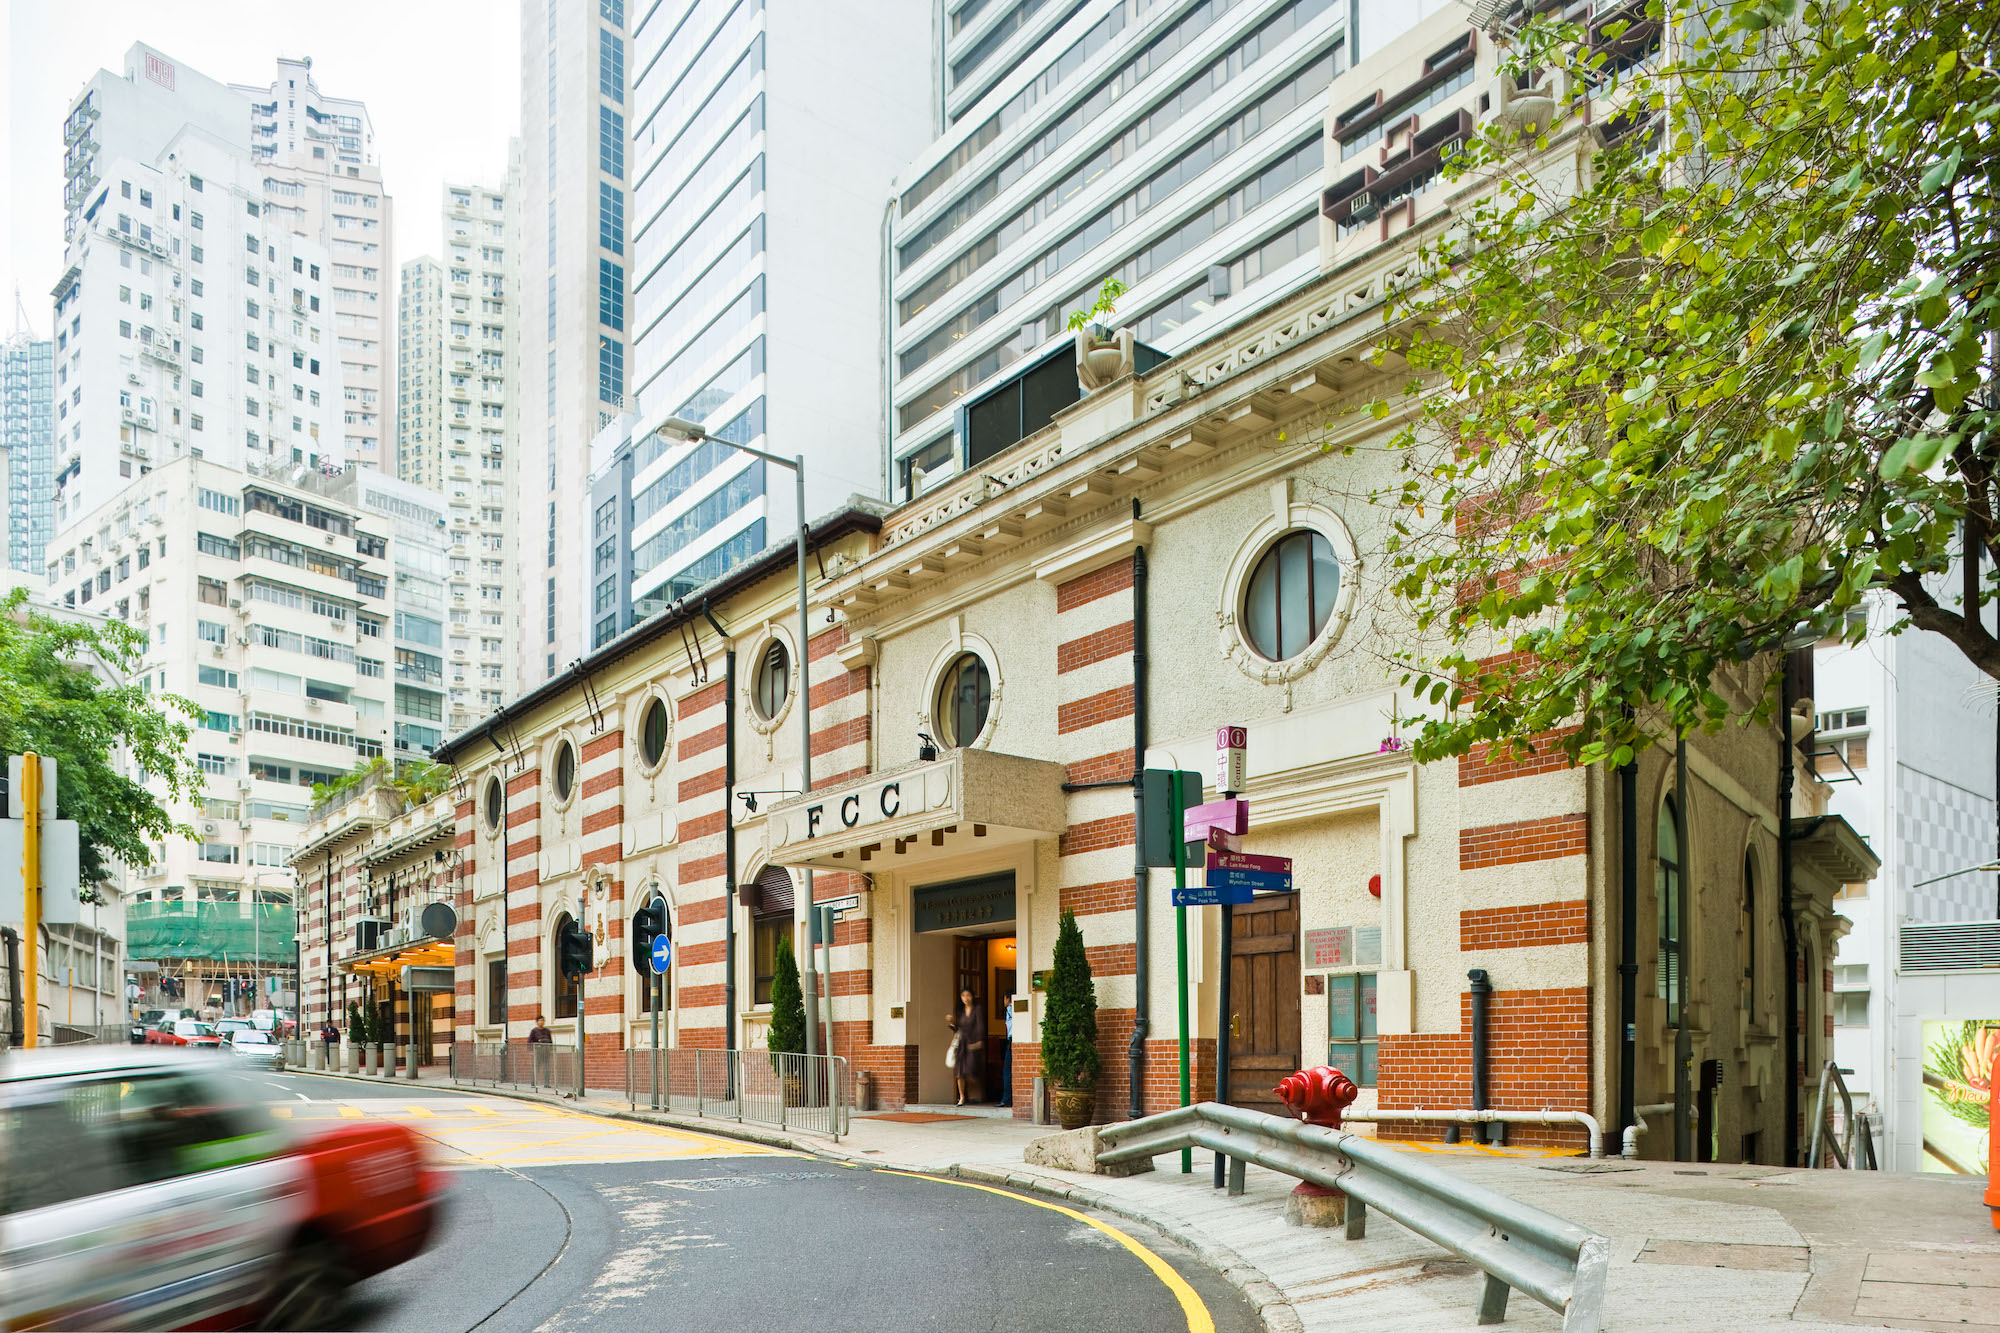 c5e4f52b17 Hong Kong heritage: 8 colonial-era restaurants and bars | CNN Travel